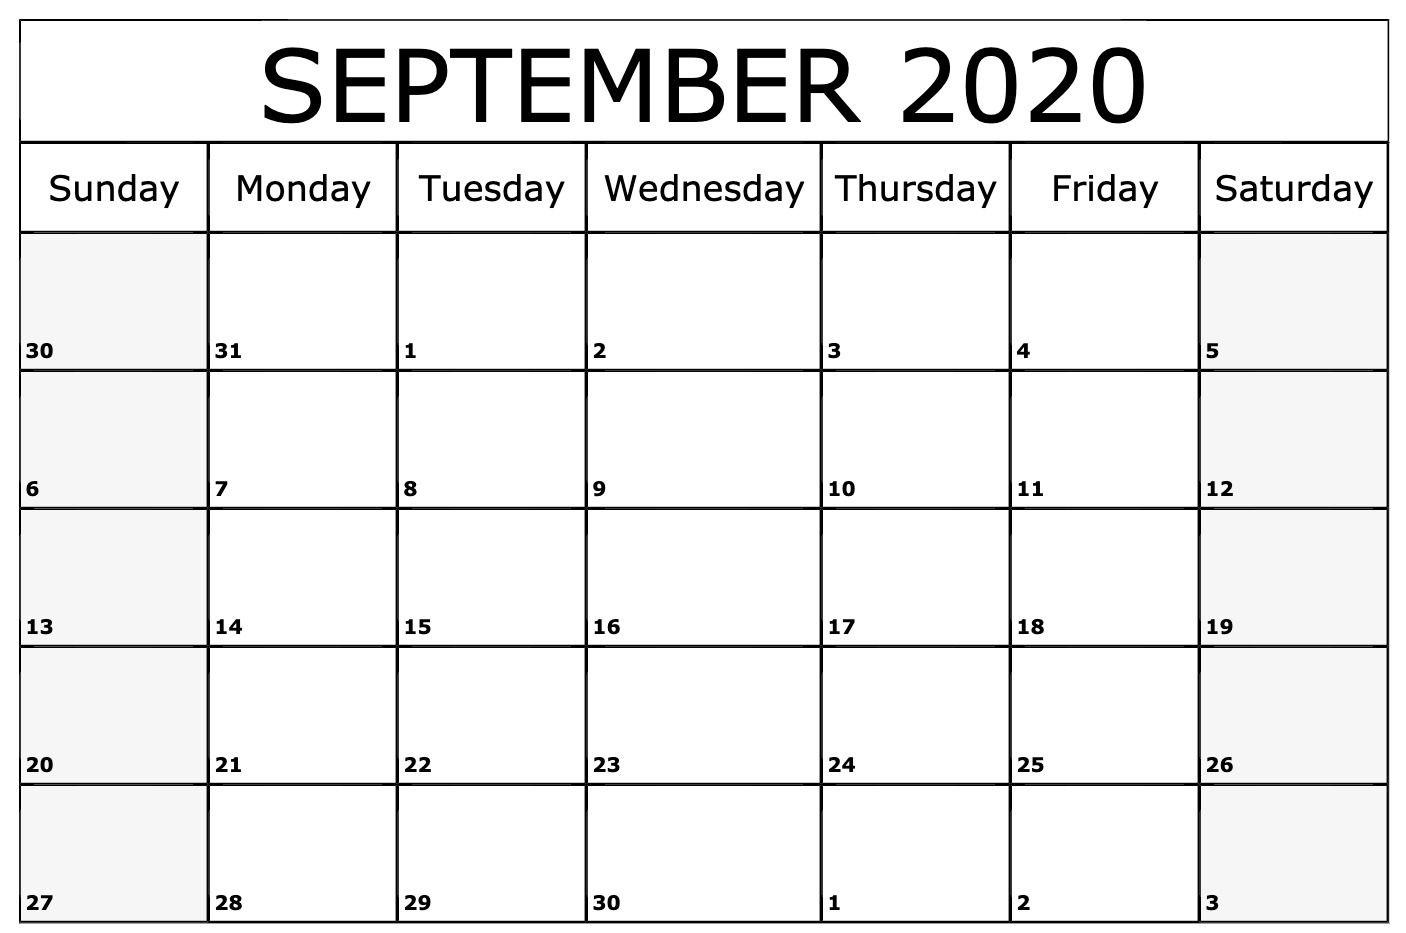 2020 September Calendar | Printable Calendar Template